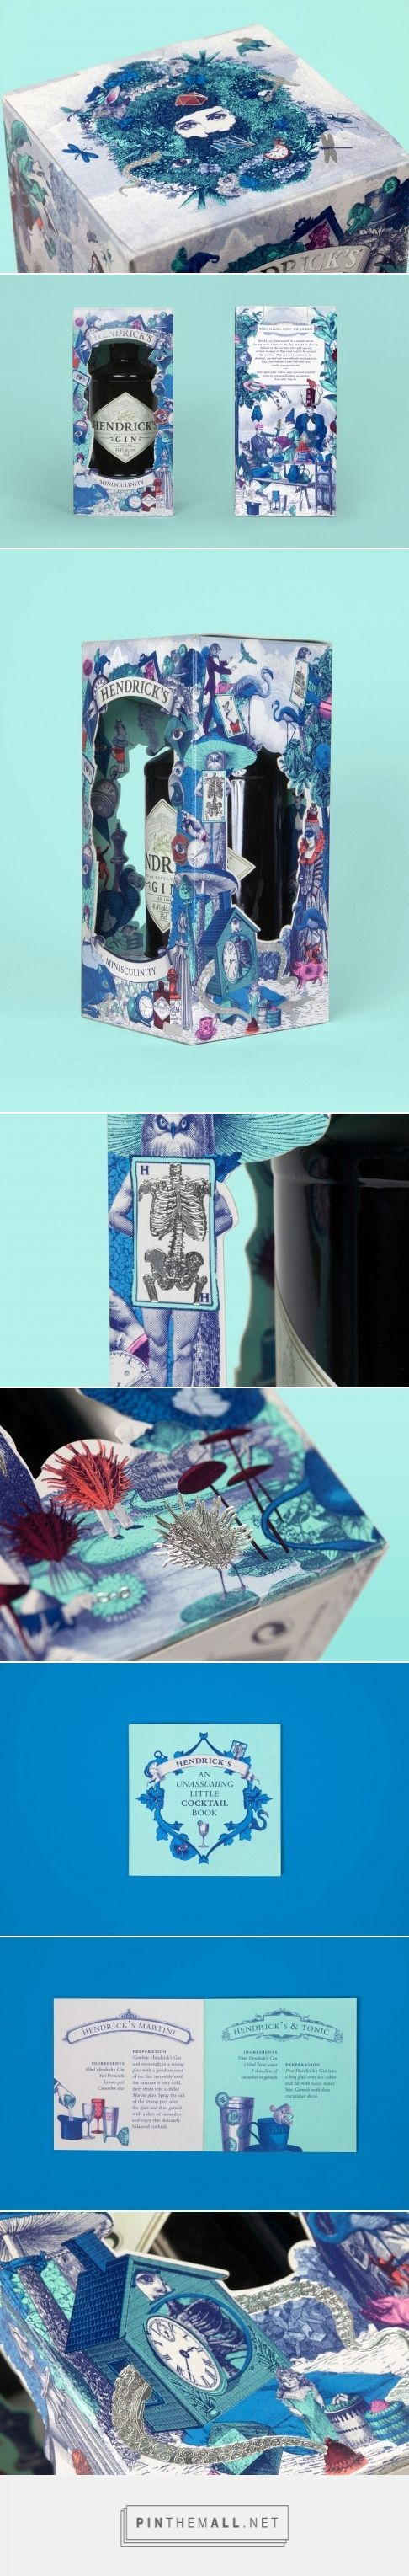 Hendrick's Minisculinity Packaging by Here Design | Fivestar Branding – Design and Branding Agency & Inspiration Gallery: